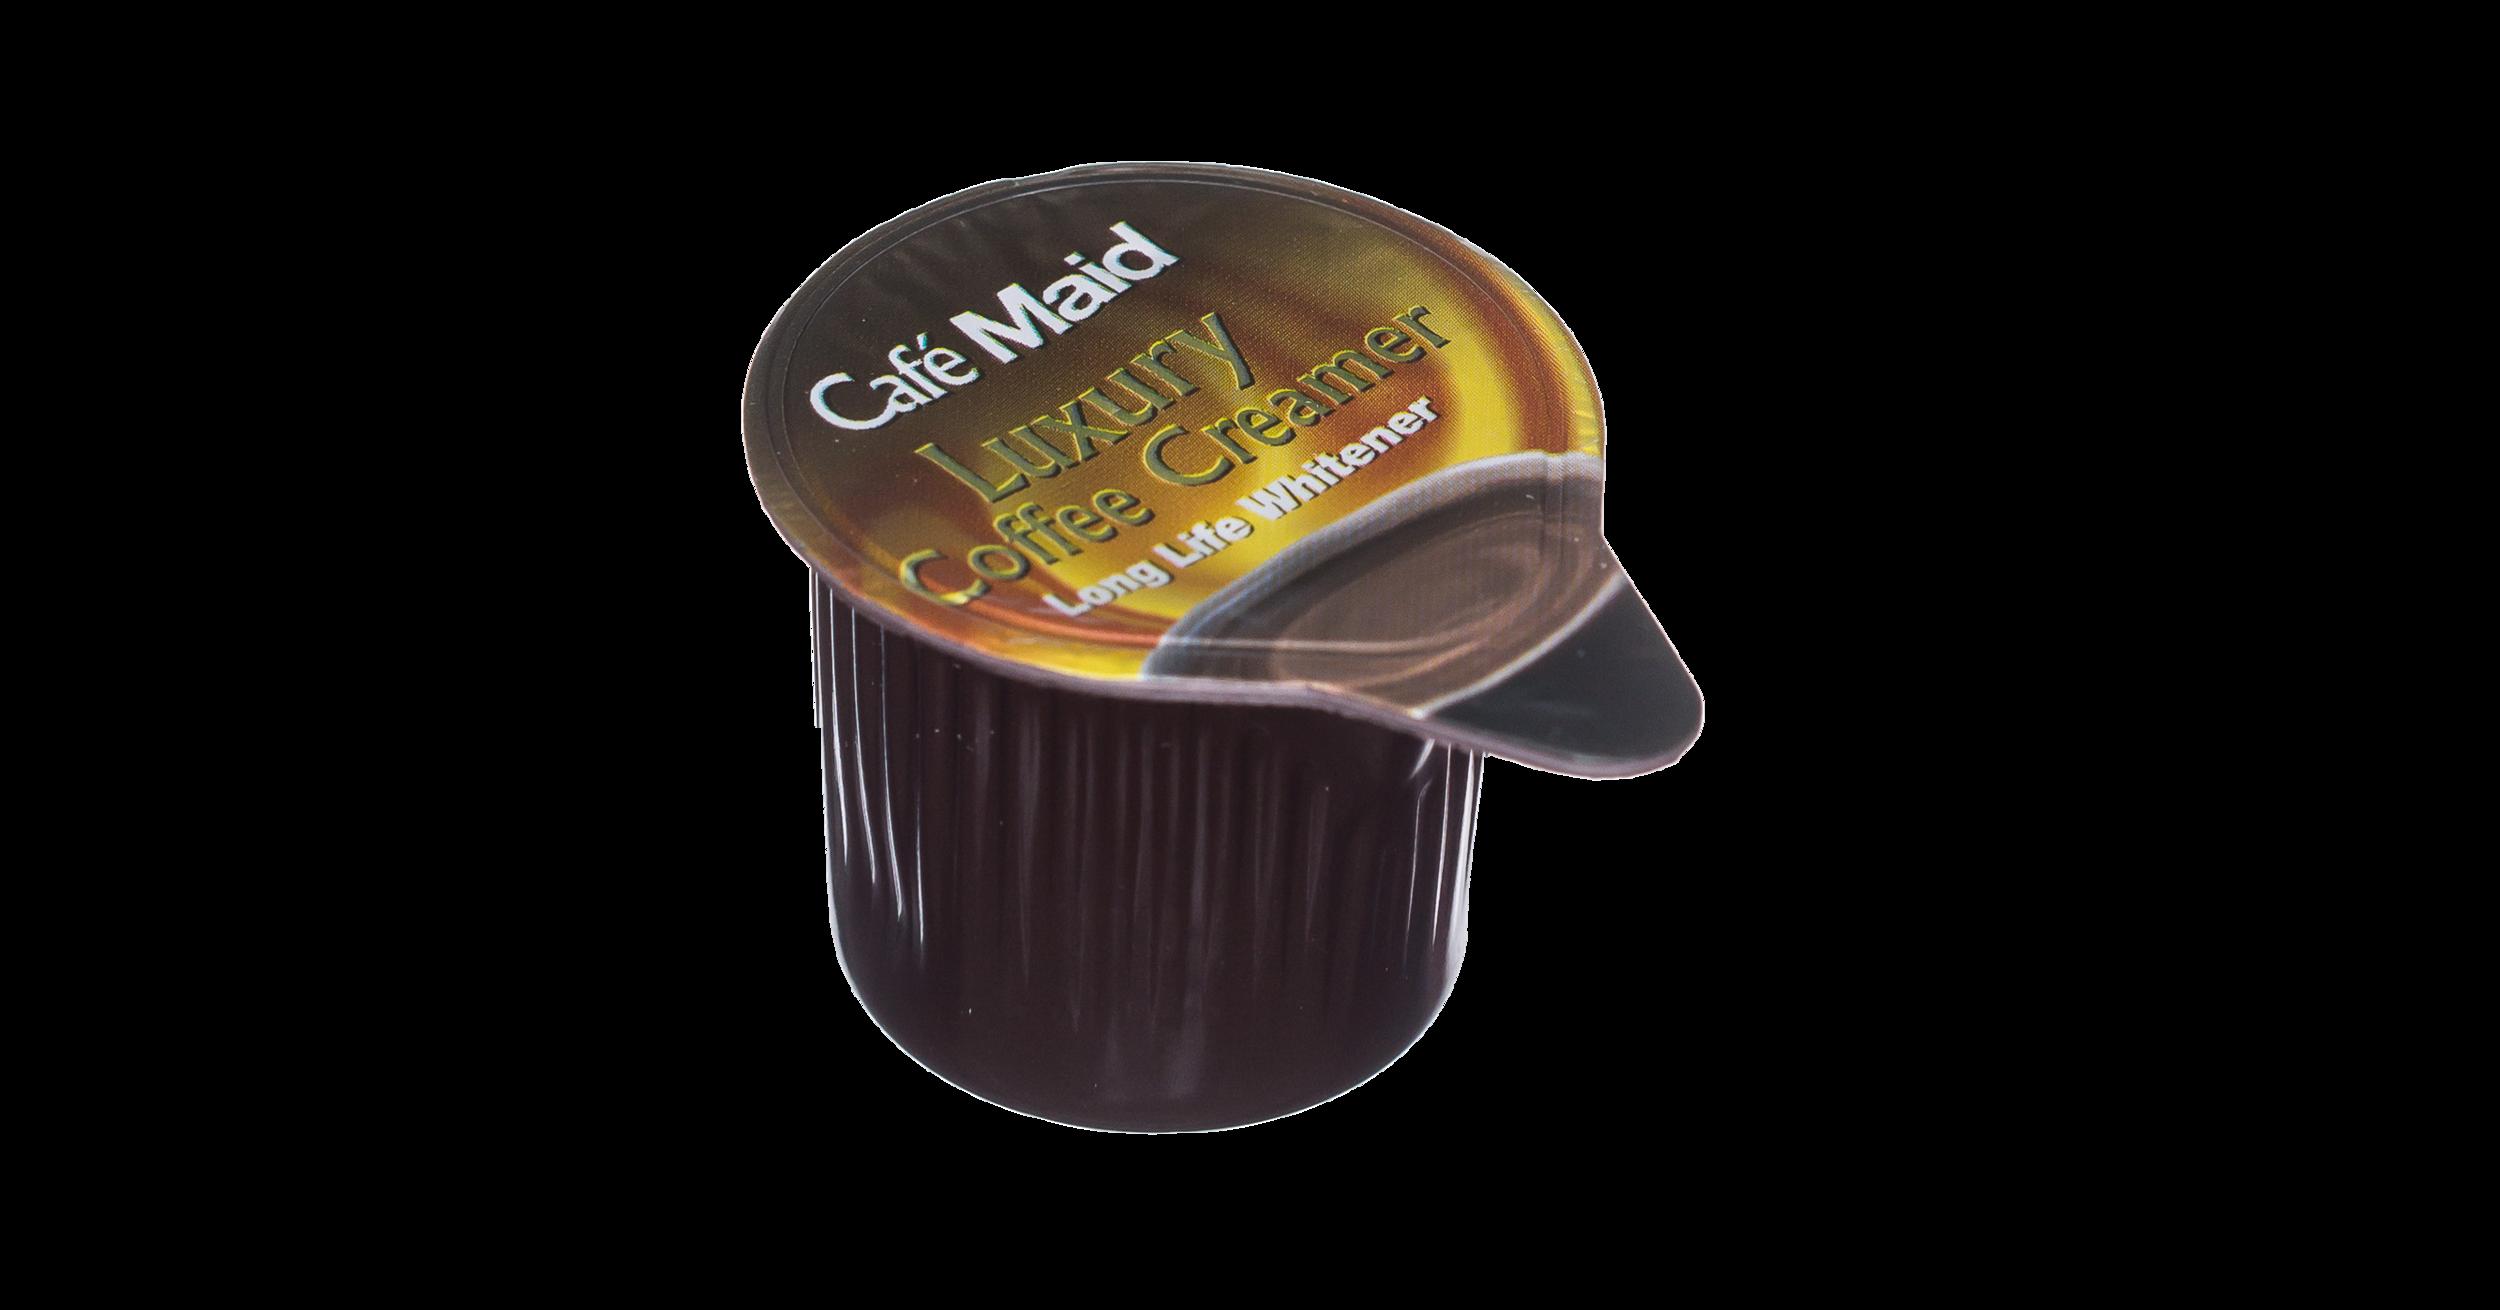 Cafe Maid - Coffee Creamer